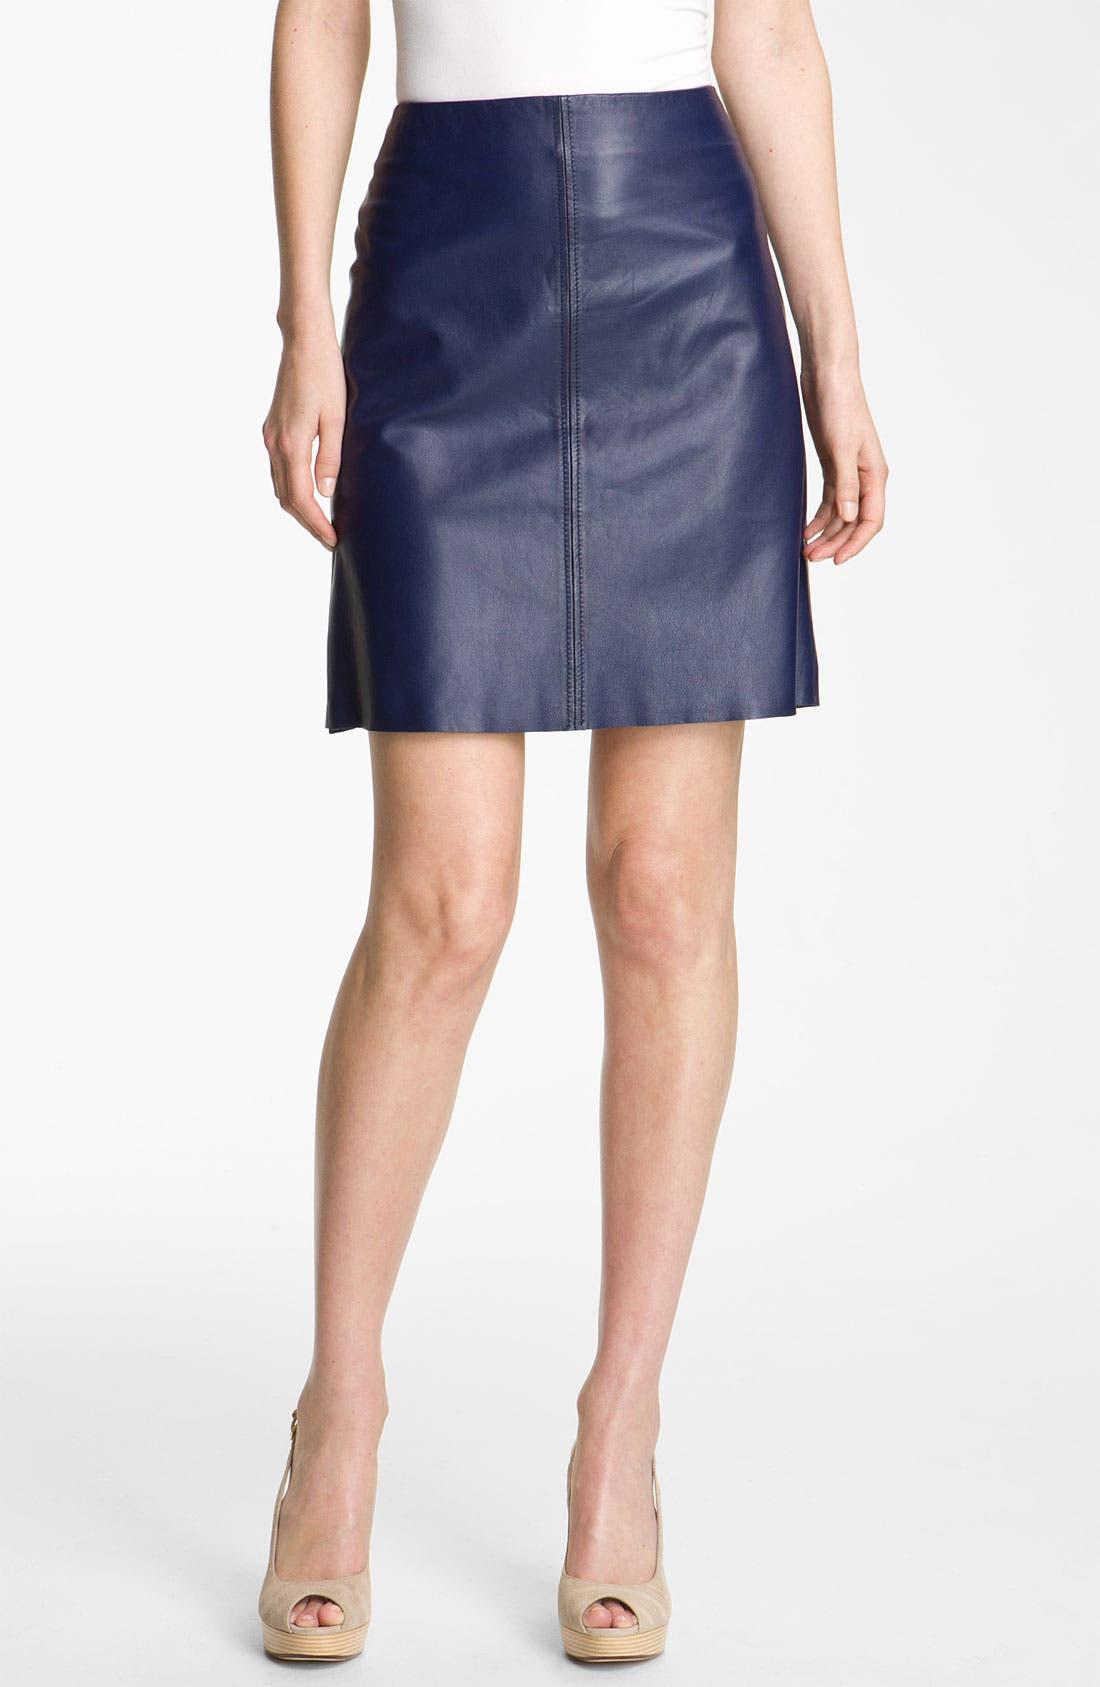 Alternate Image 1 Selected - Weekend Max Mara 'Affine' Leather Skirt